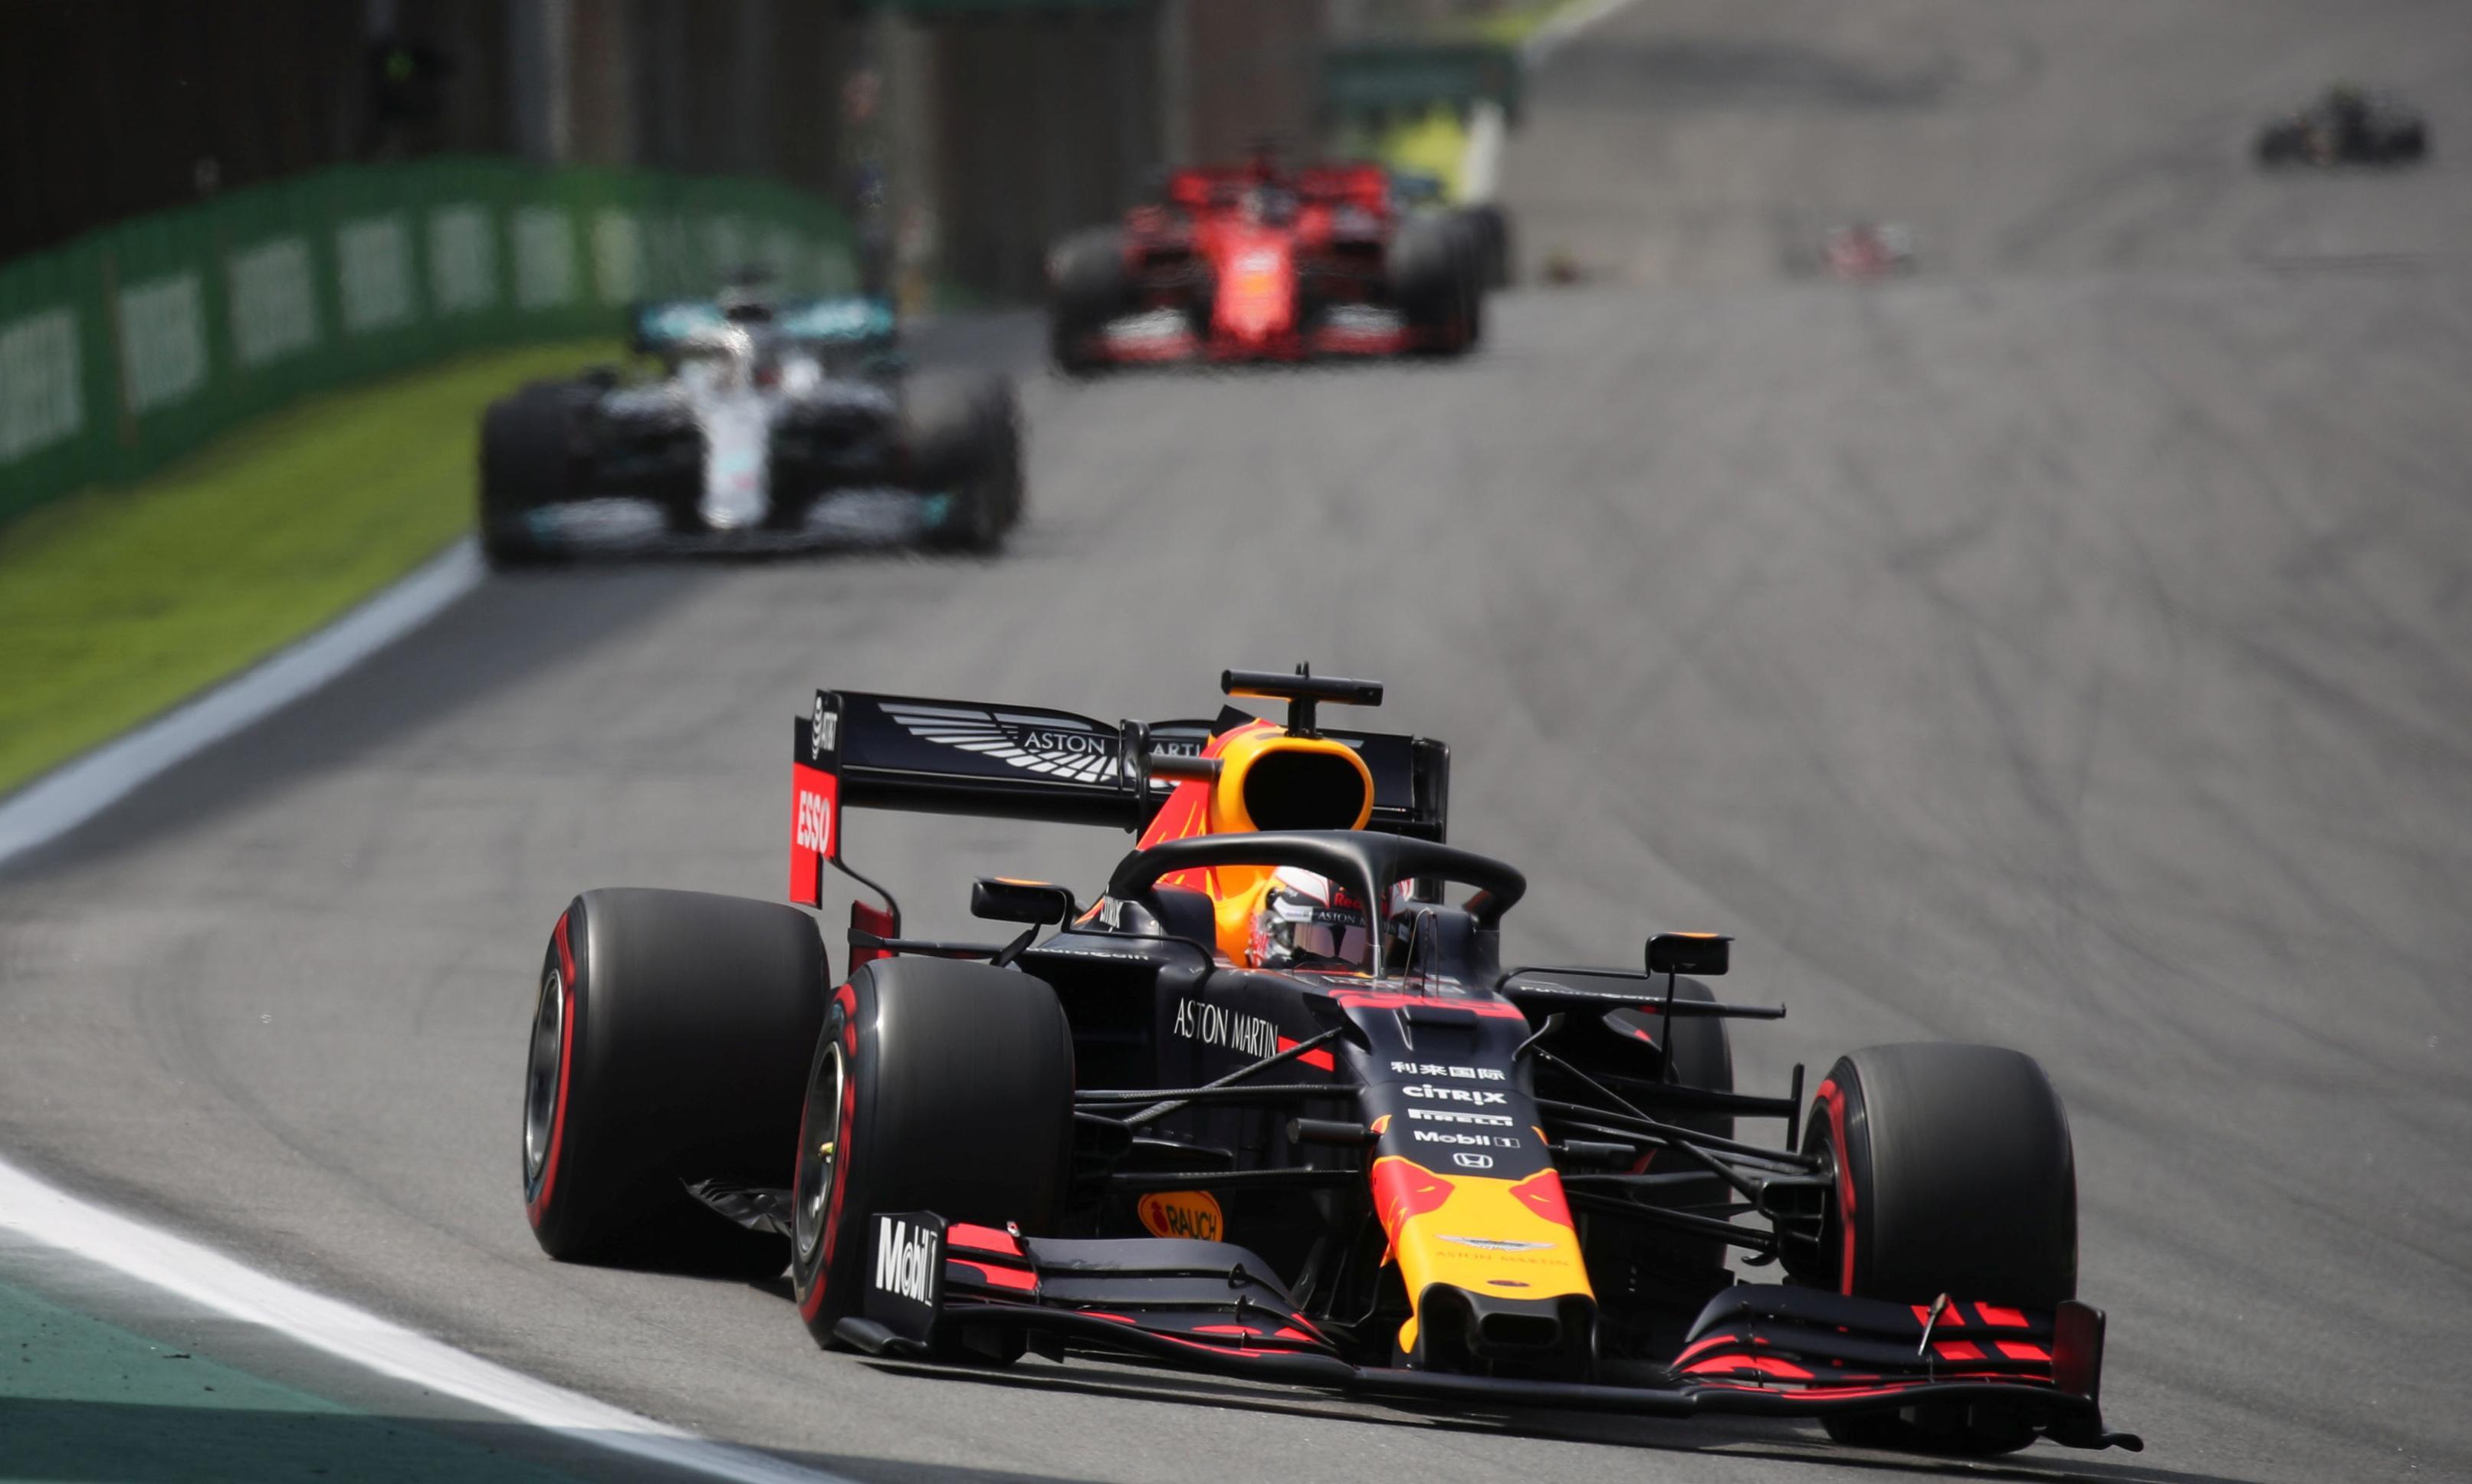 Verstappen's verve lights up Brazilian Grand Prix but Ferrari flounder again